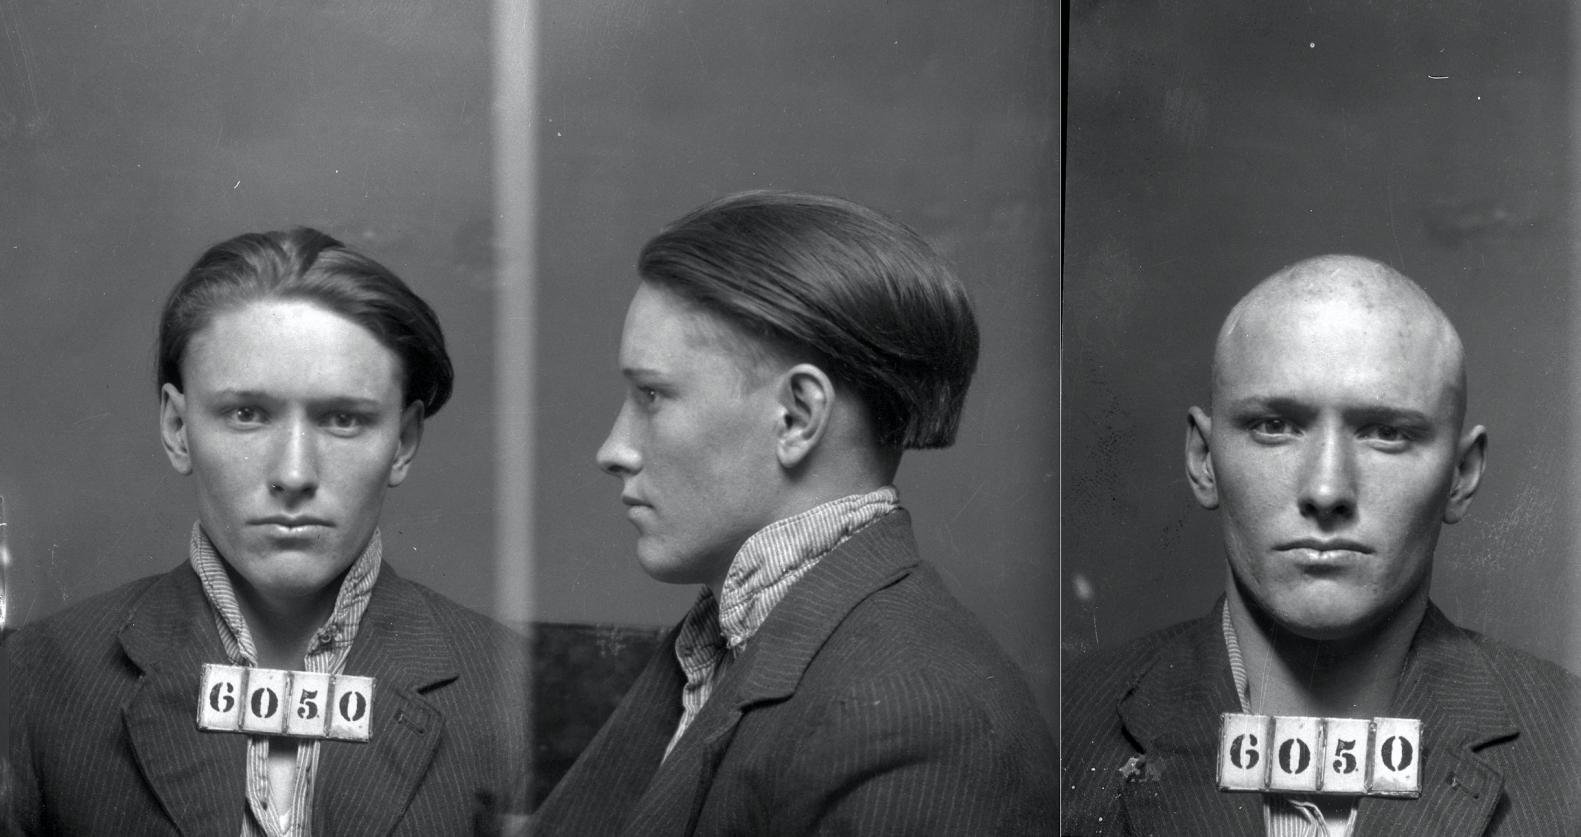 AlfredSpicer NM 1928